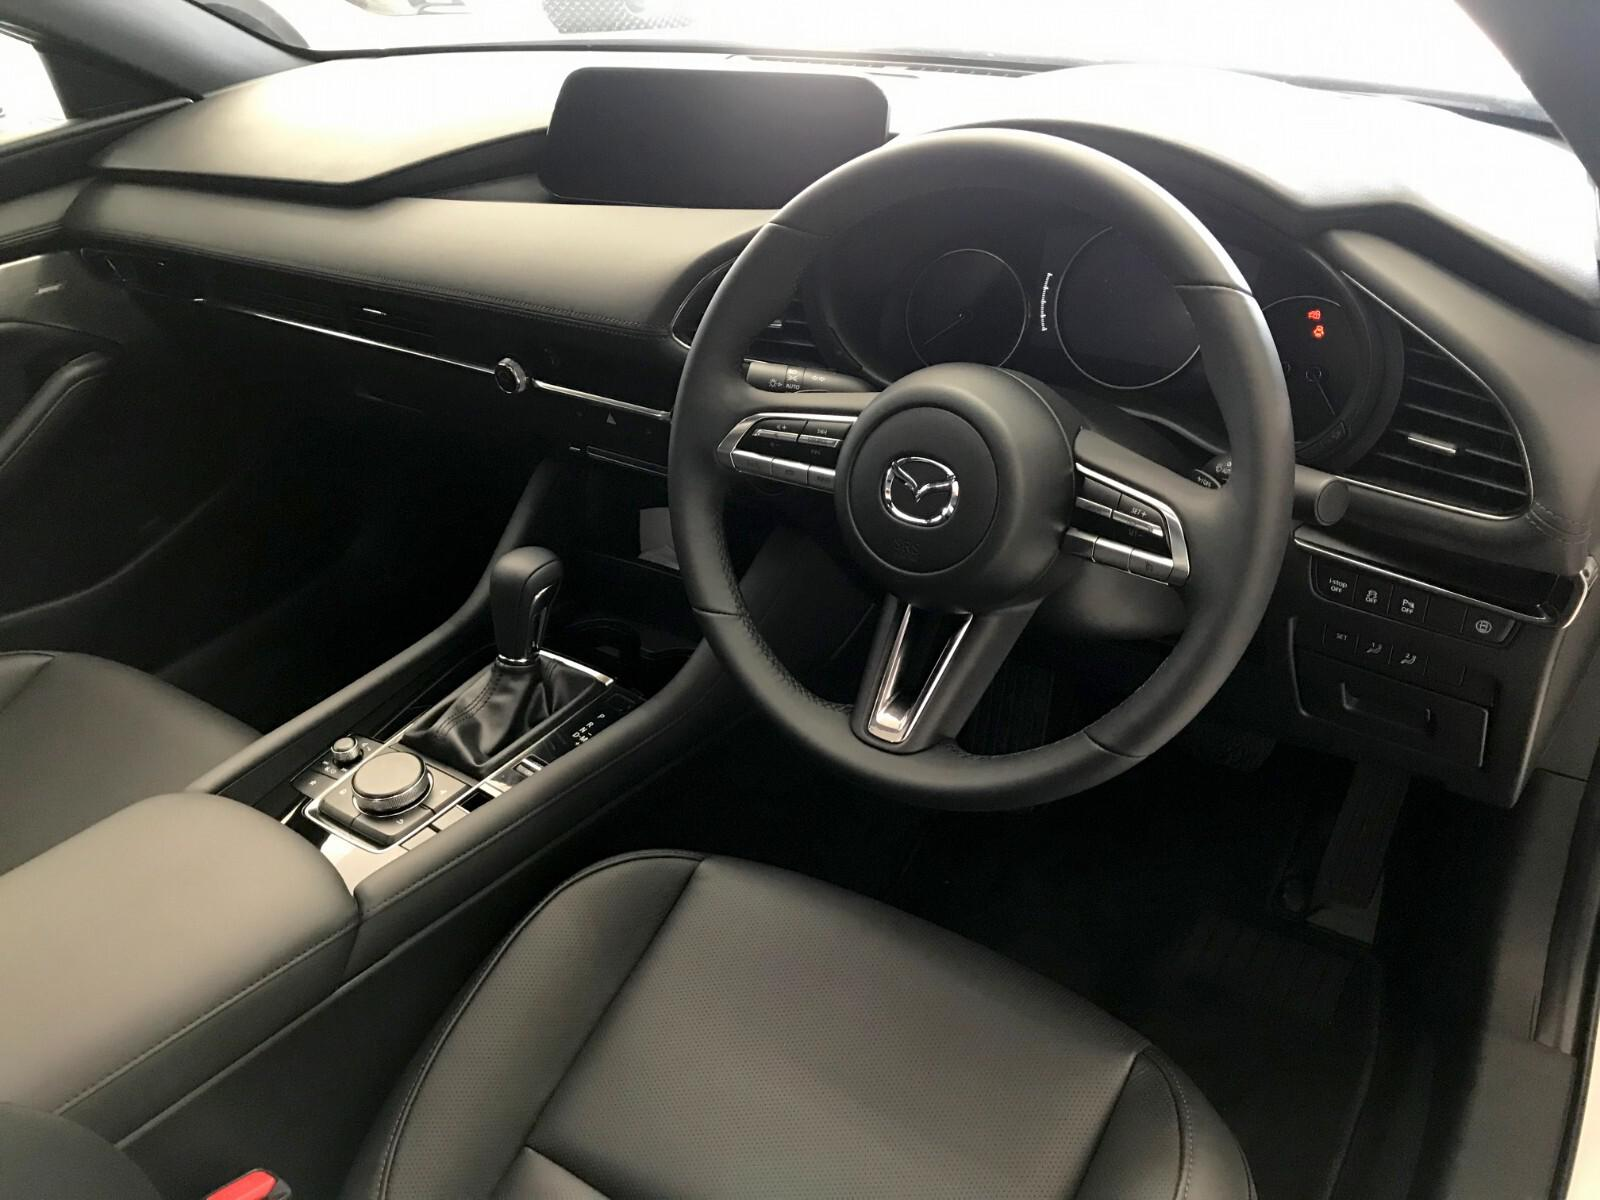 Mazda hatch 2.0 Astina